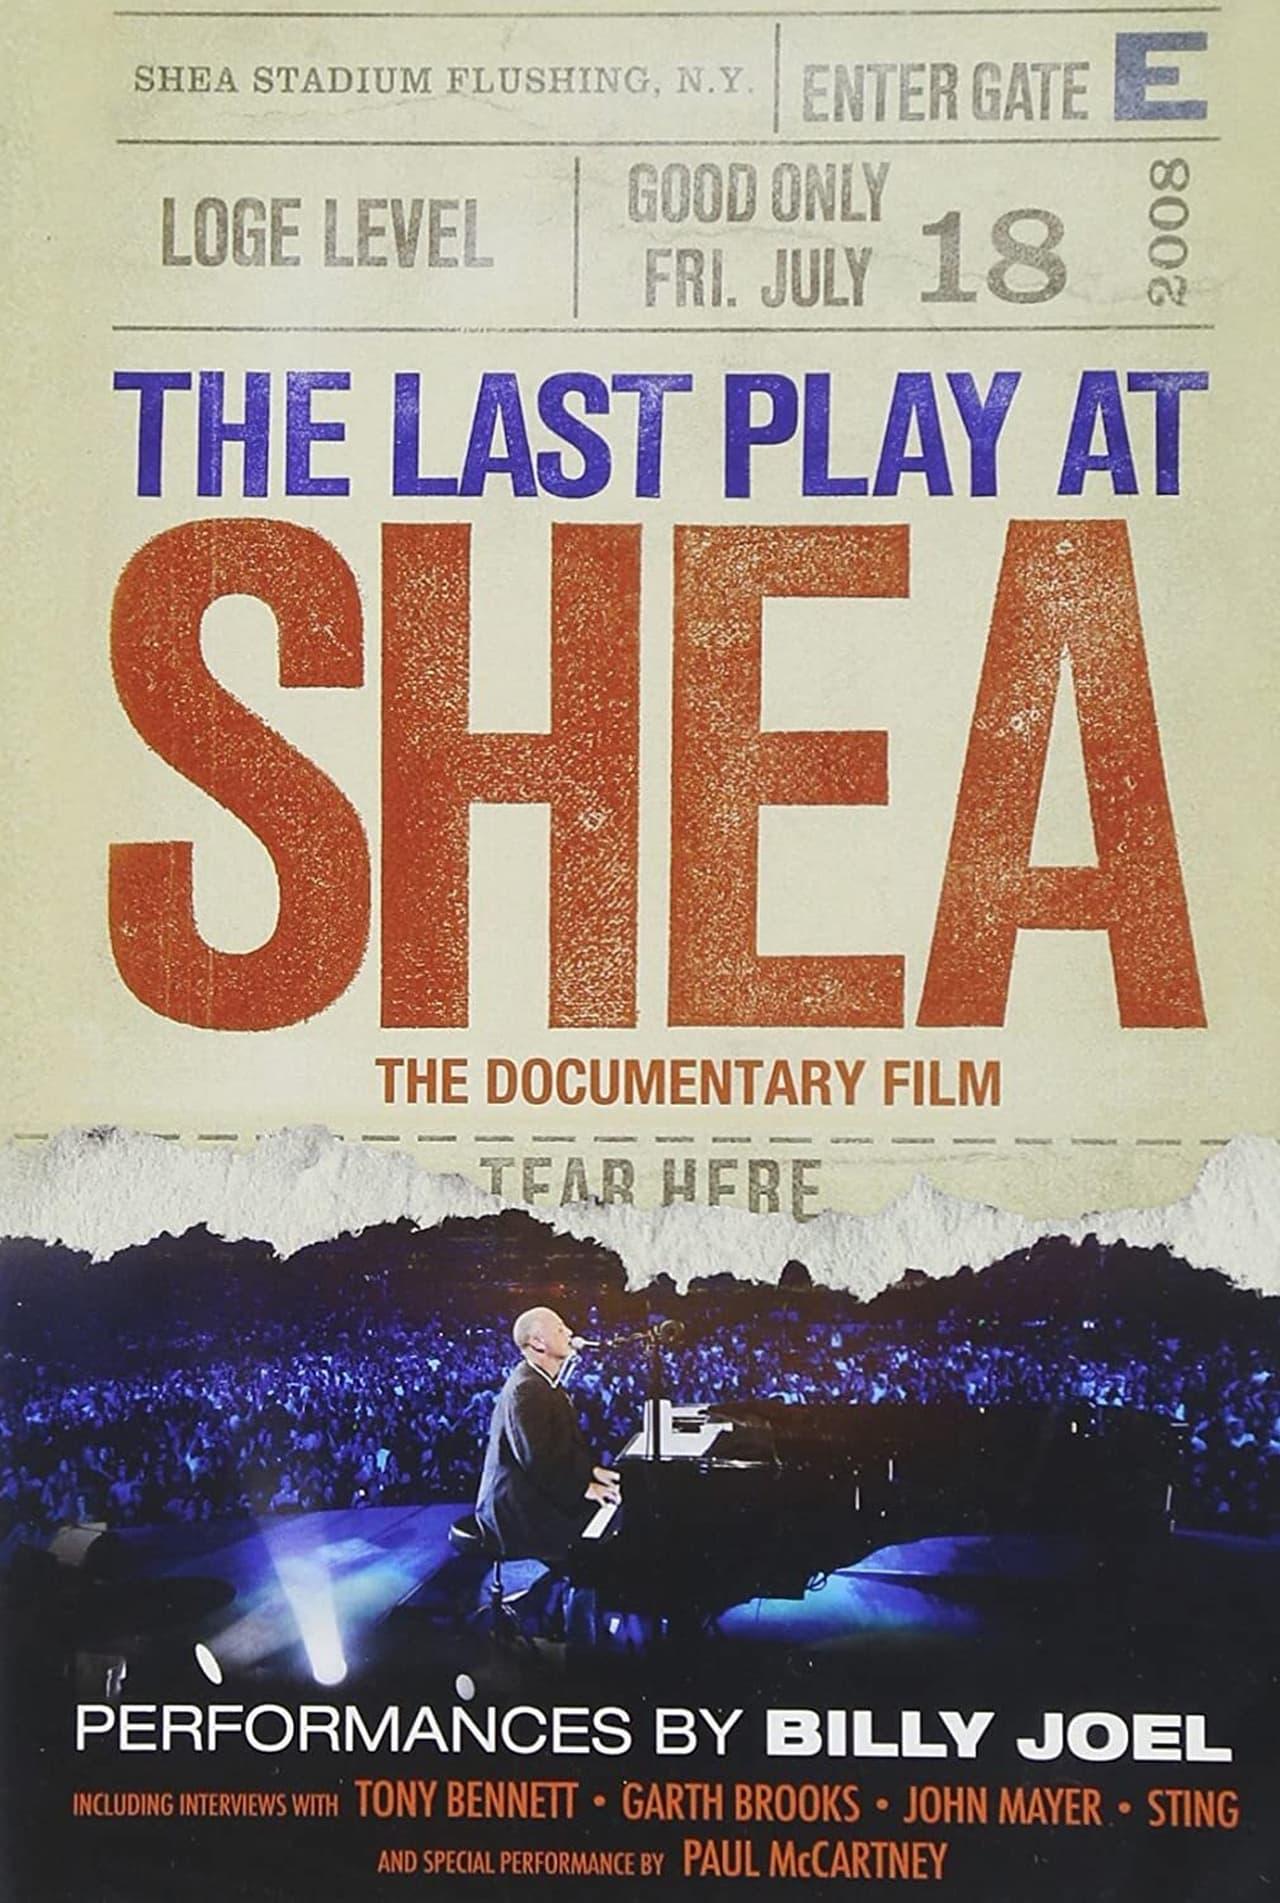 Billy Joel - The Last Play at Shea